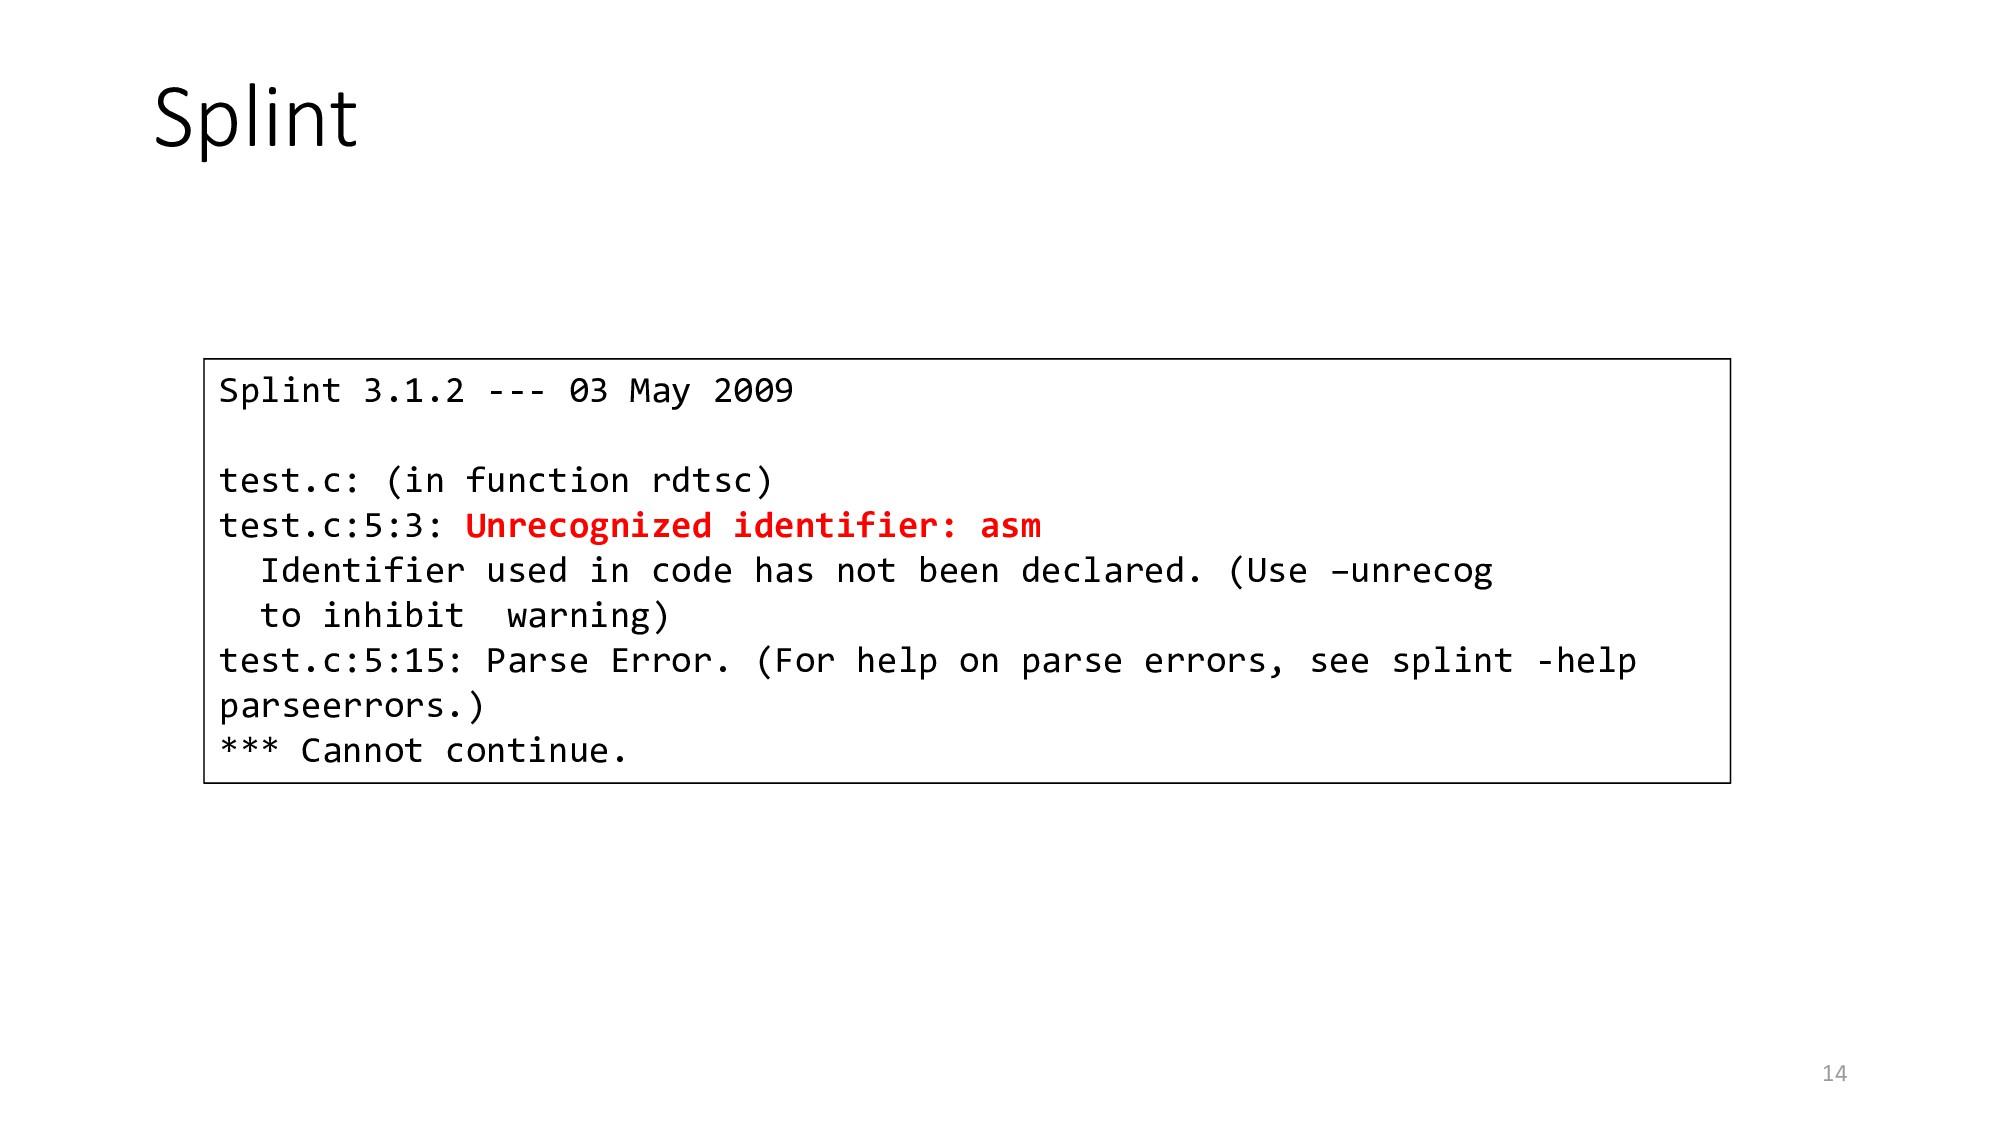 Splint 14 Splint 3.1.2 --- 03 May 2009 test.c: ...